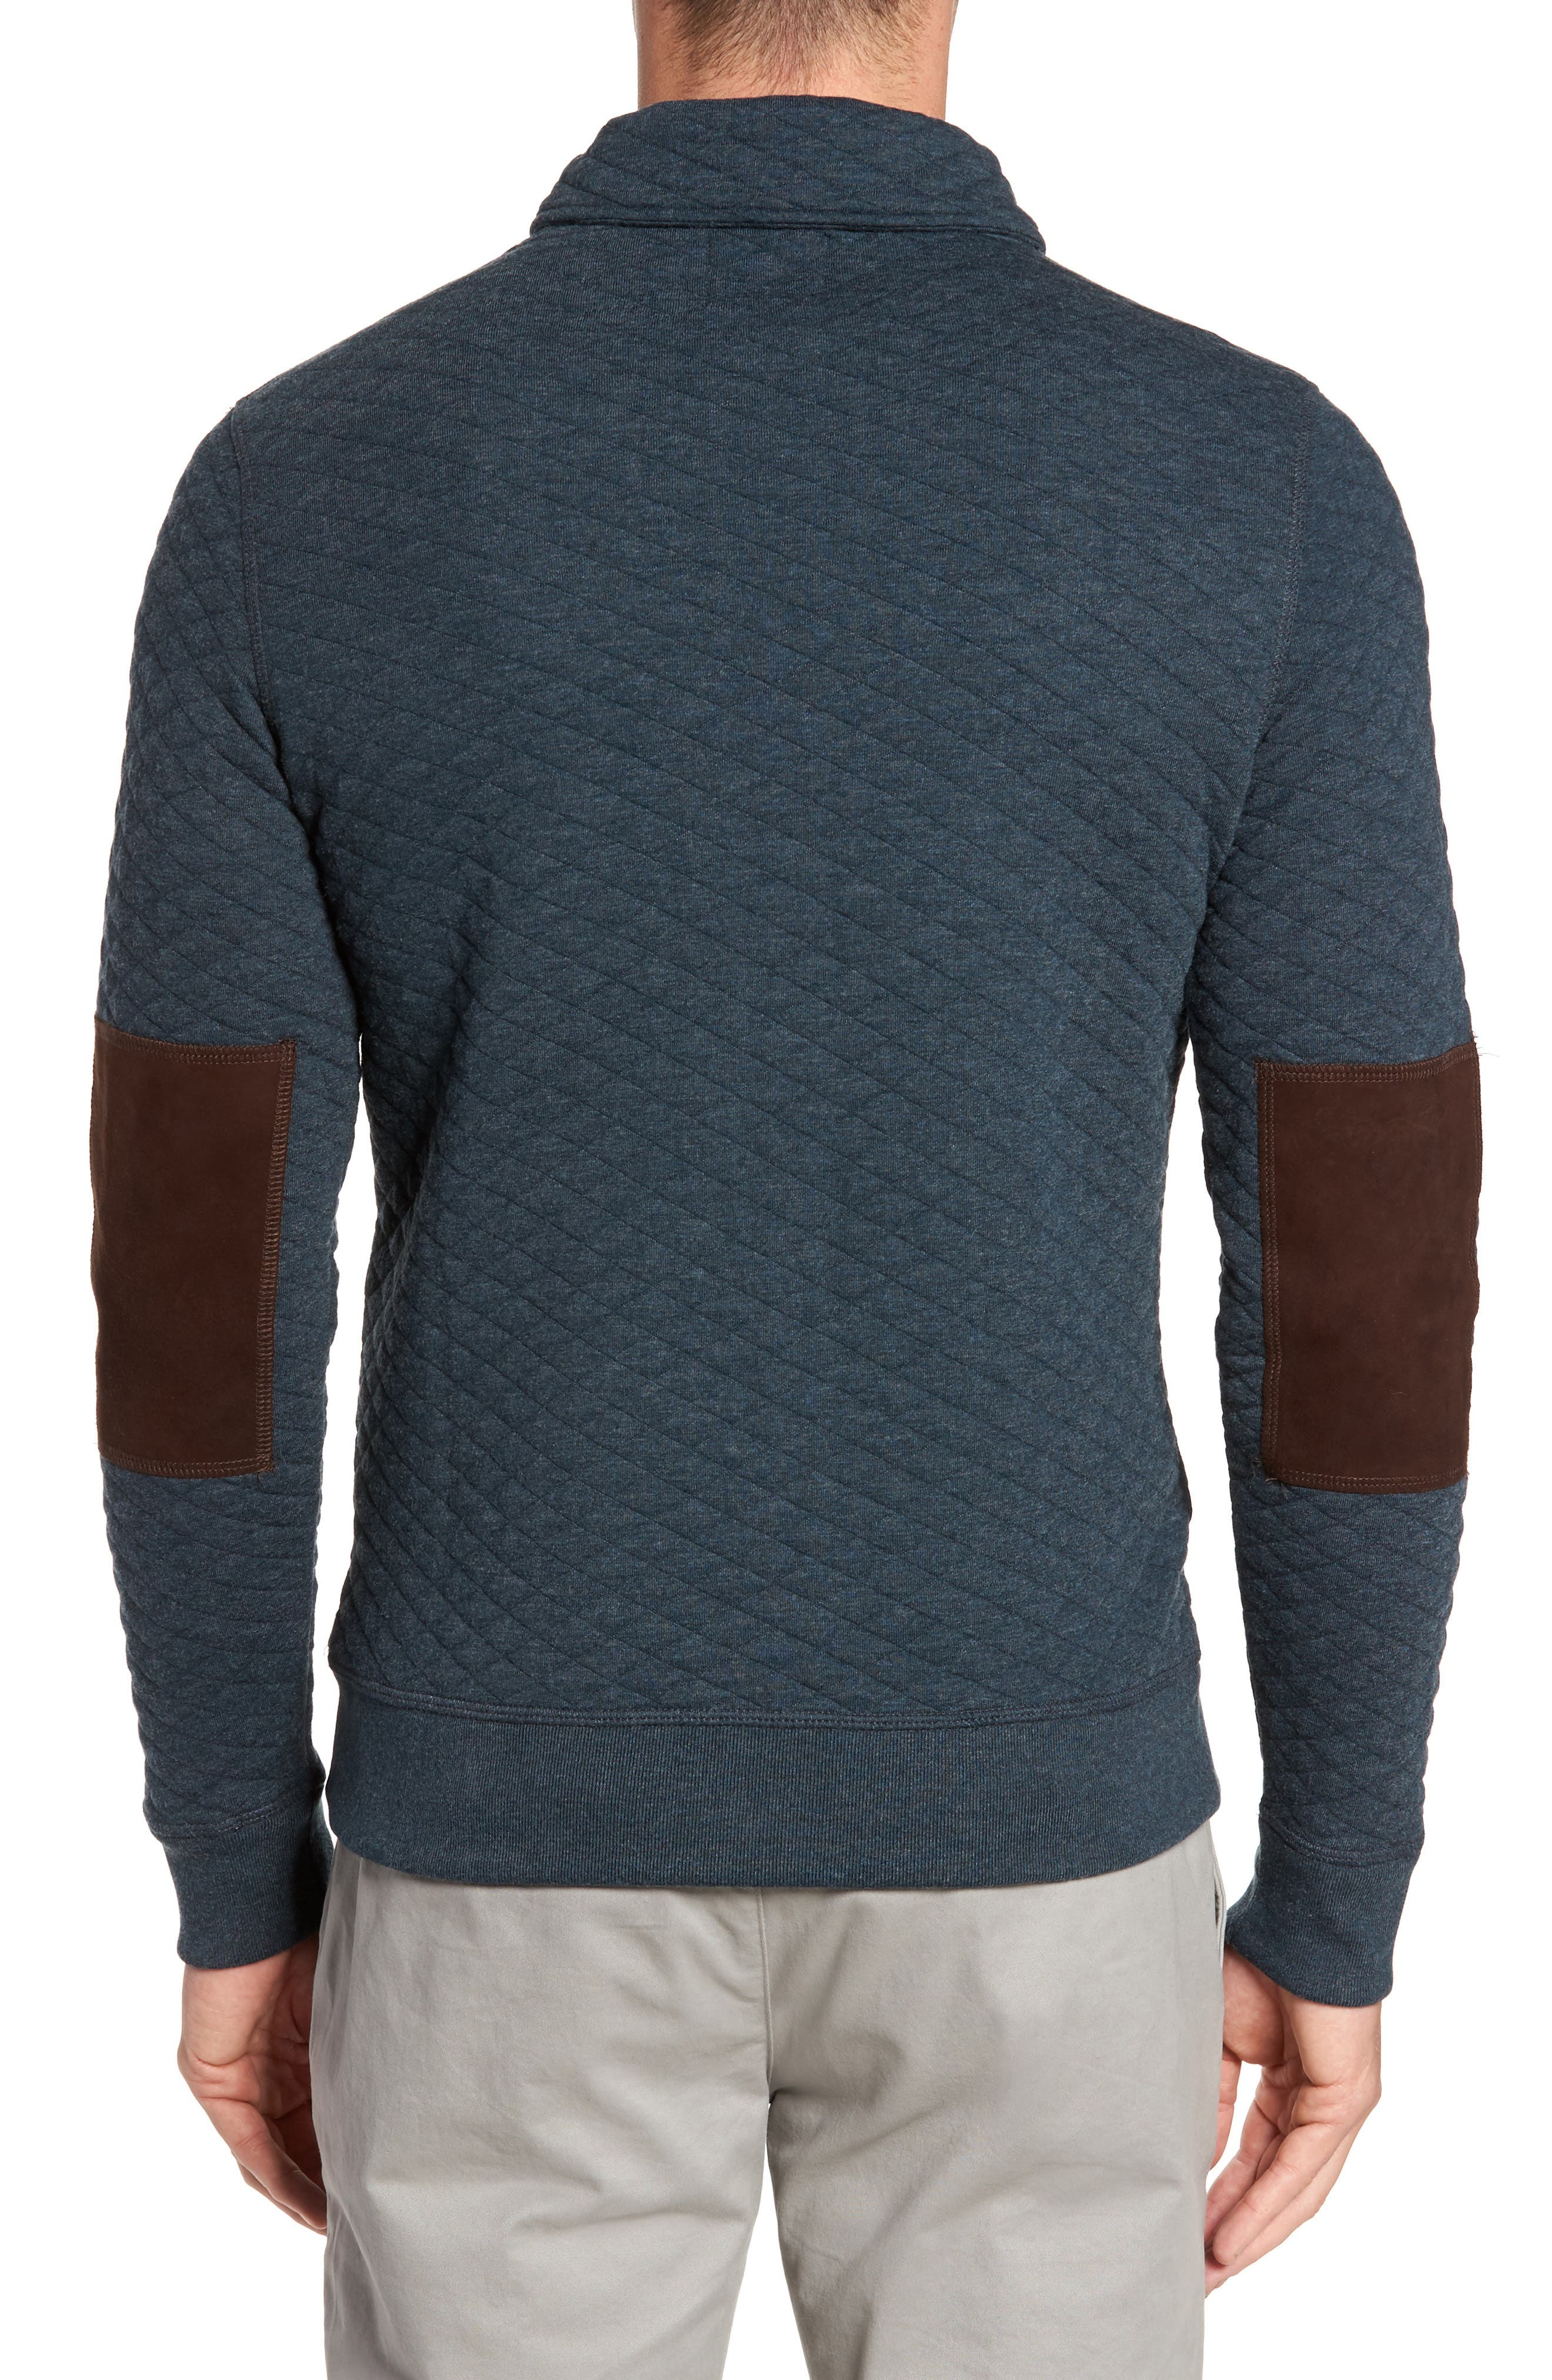 BILLY REID,                             Shawl Collar Pullover,                             Alternate thumbnail 2, color,                             402